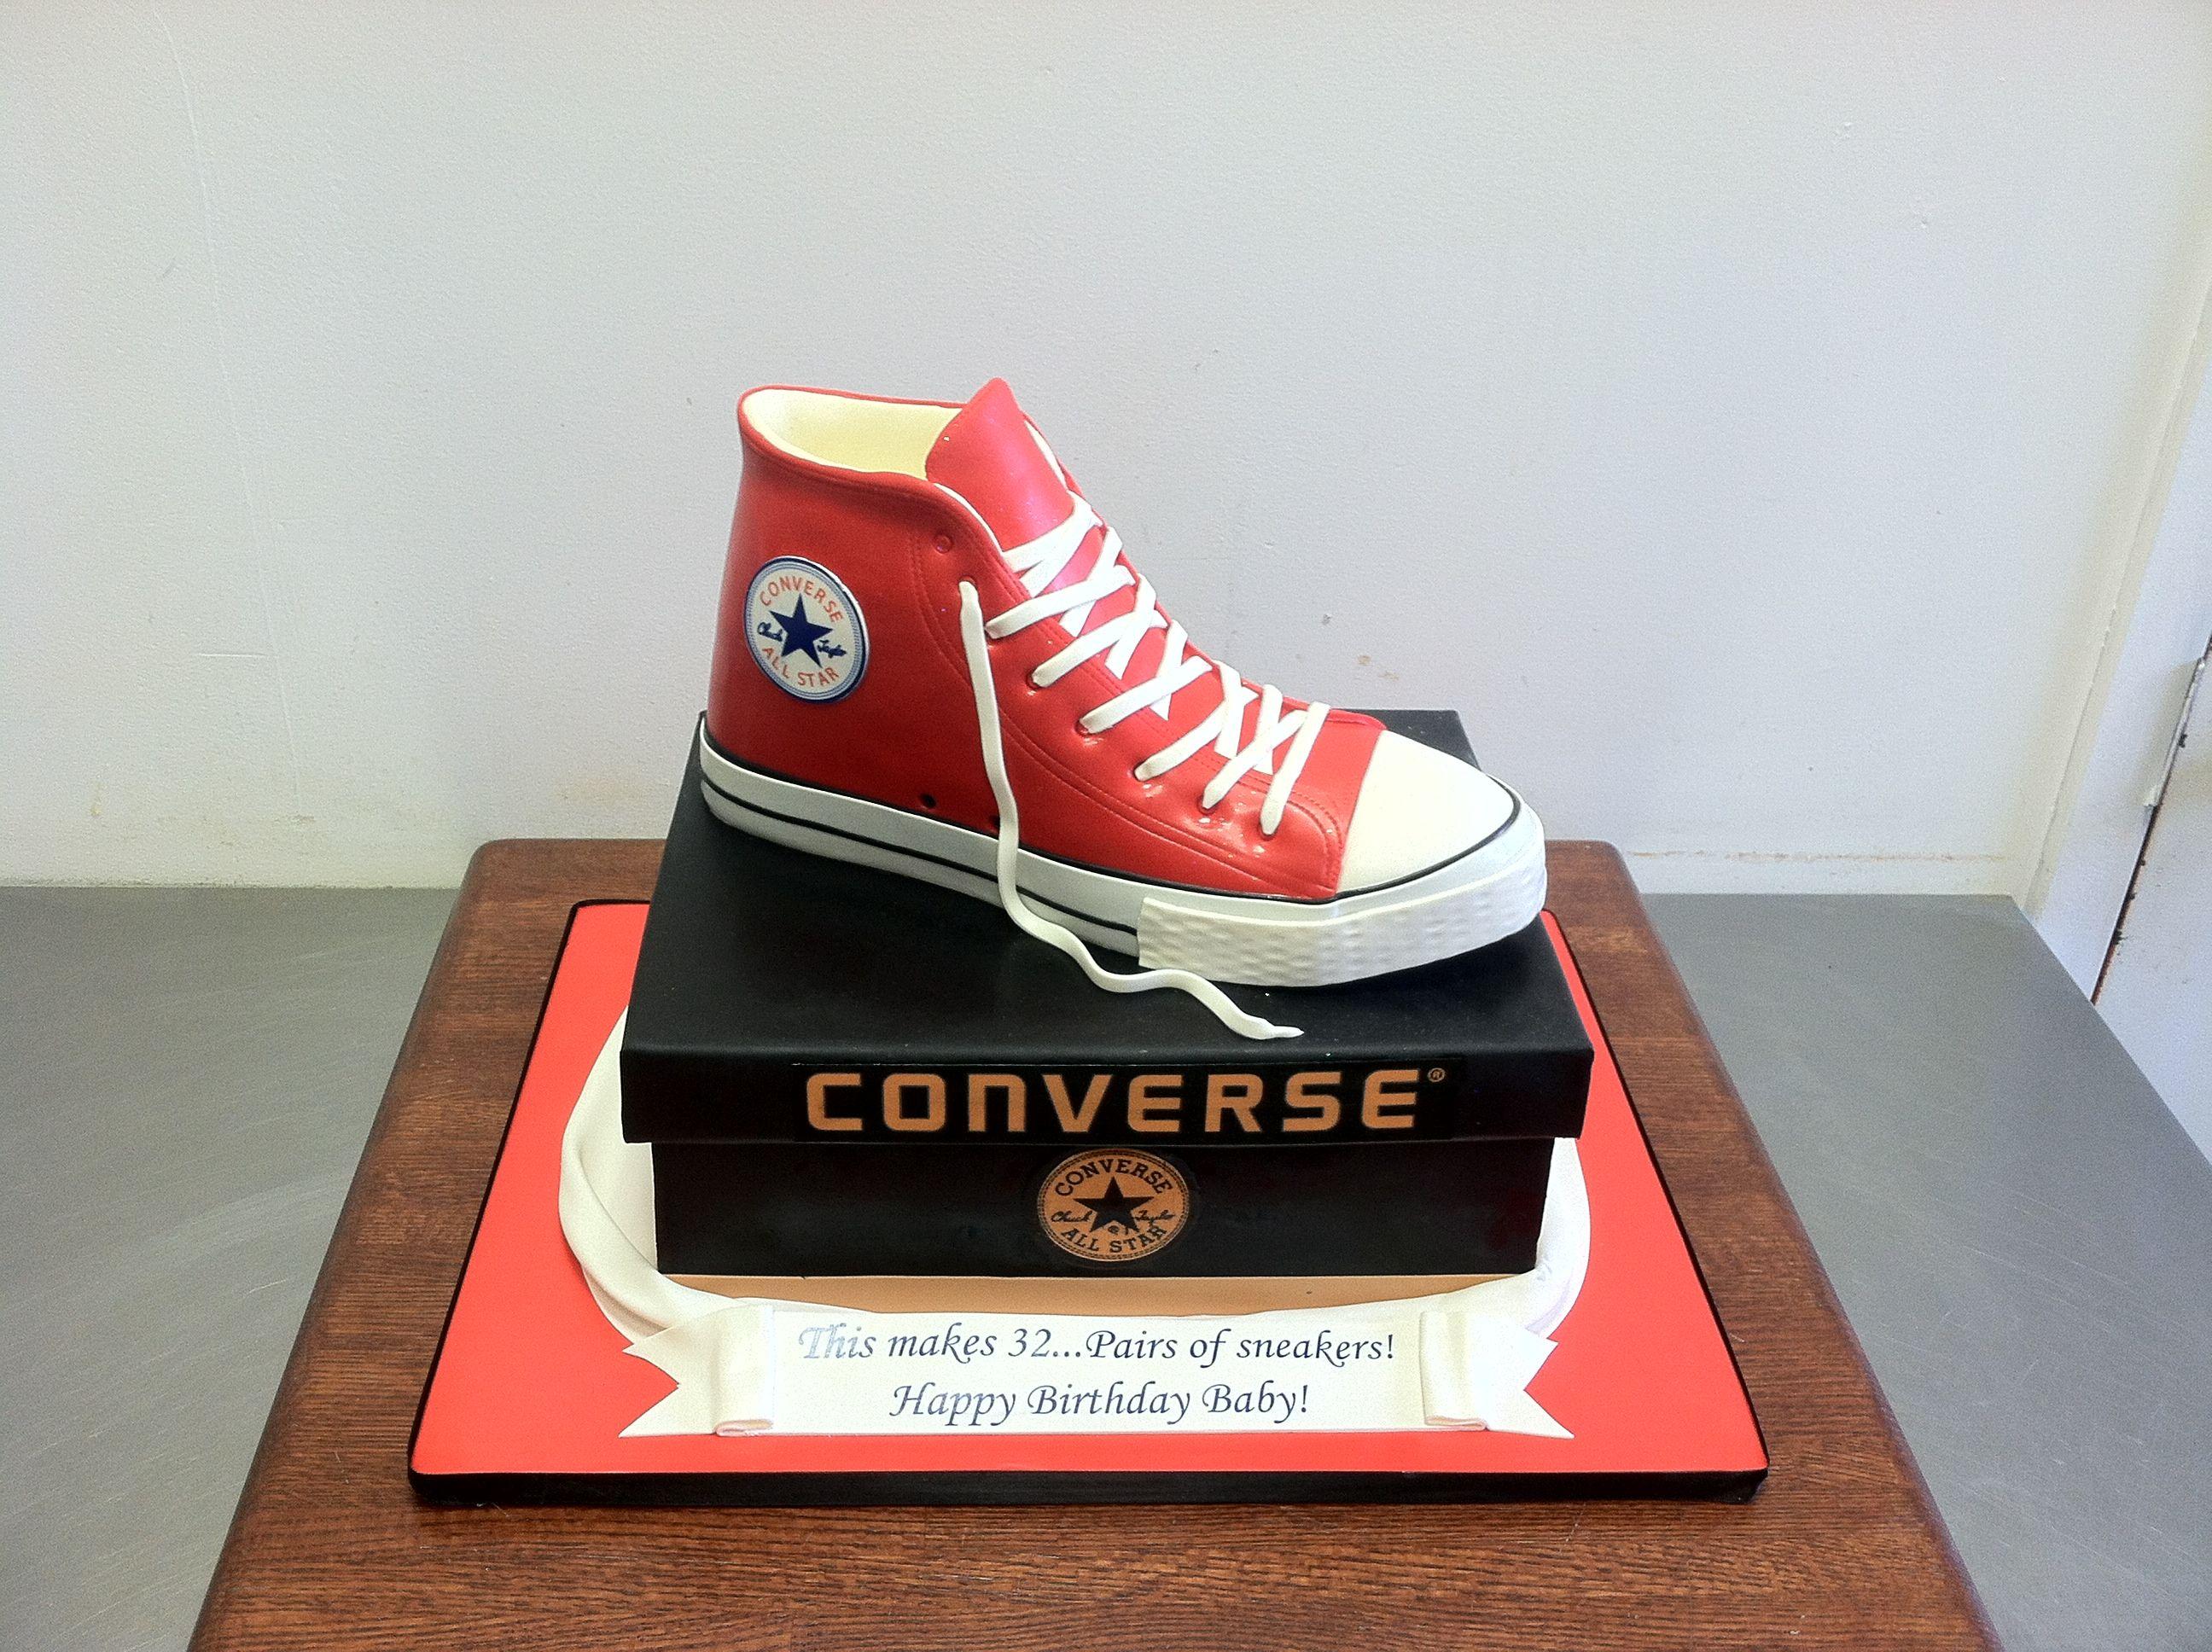 Converse all star cake | Converse cake, Happy birthday